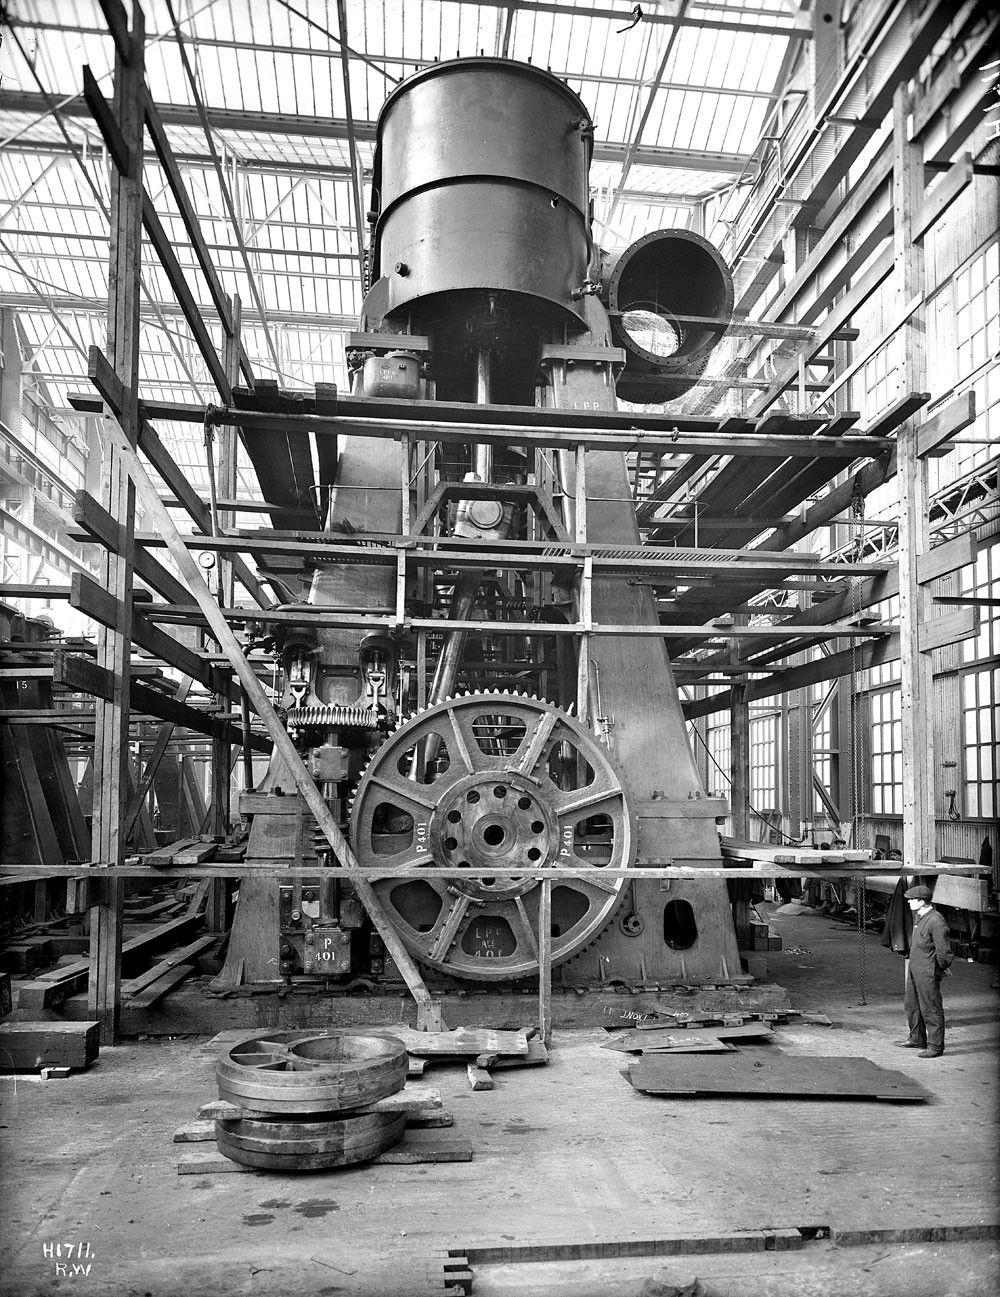 Titanic Engine Room Coal: Rms Titanic, Titanic Ship, Titanic